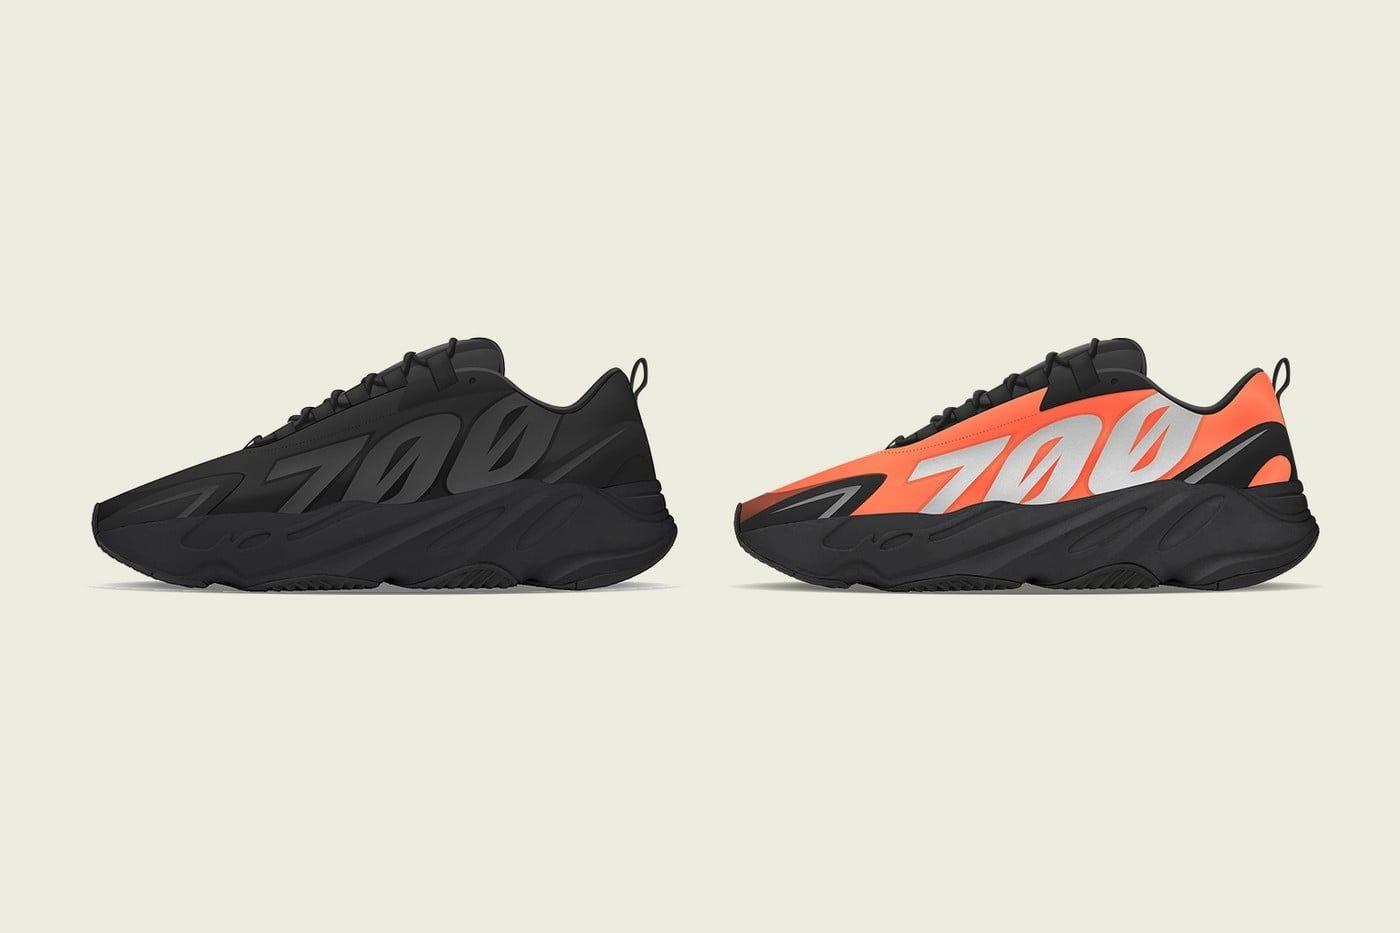 The adidas Yeezy Boost 700 MNVN